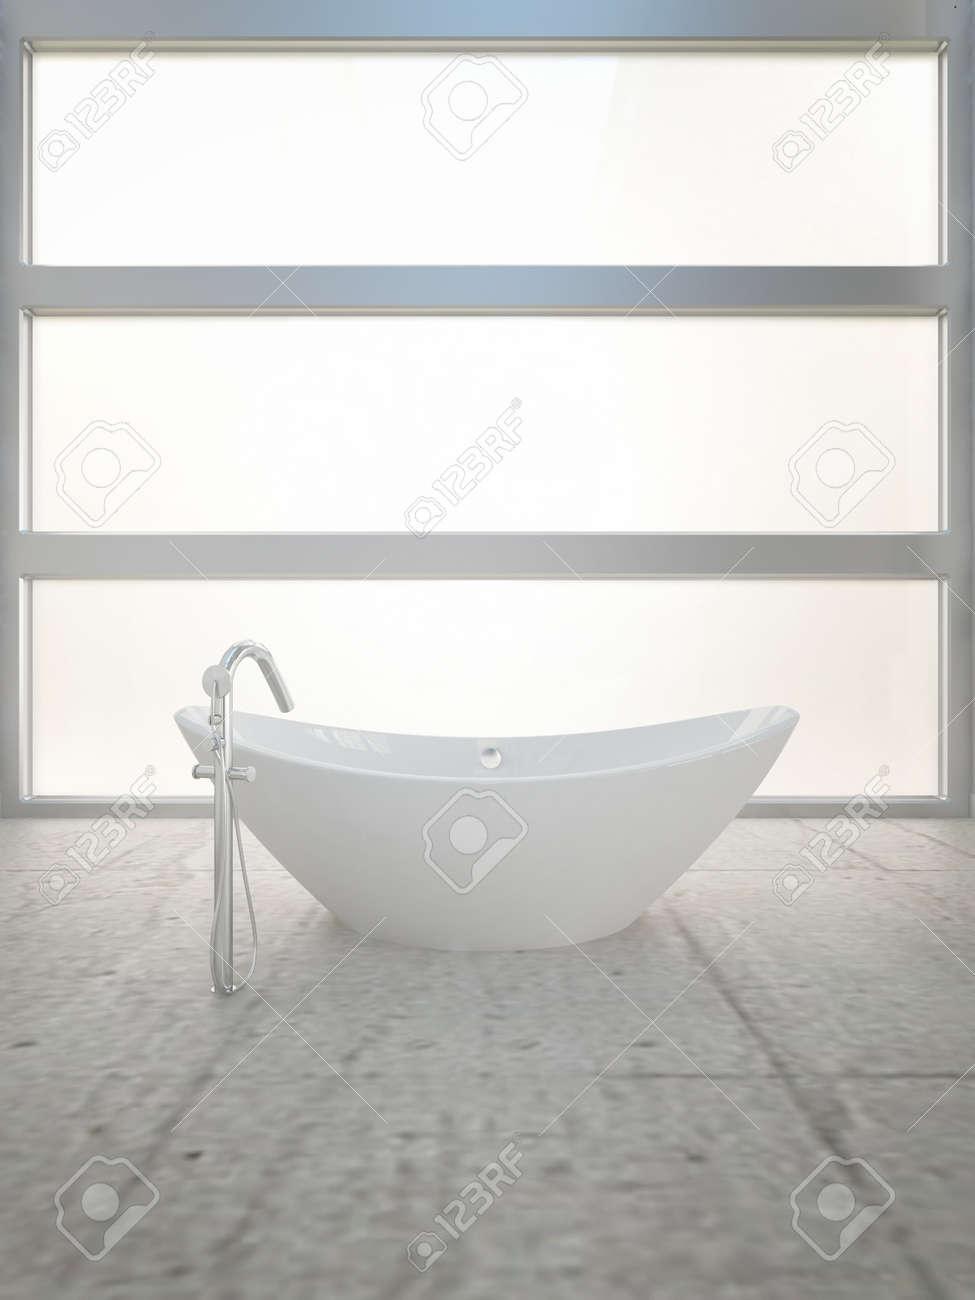 A 3d rendering of modern bathtub Stock Photo - 19459746